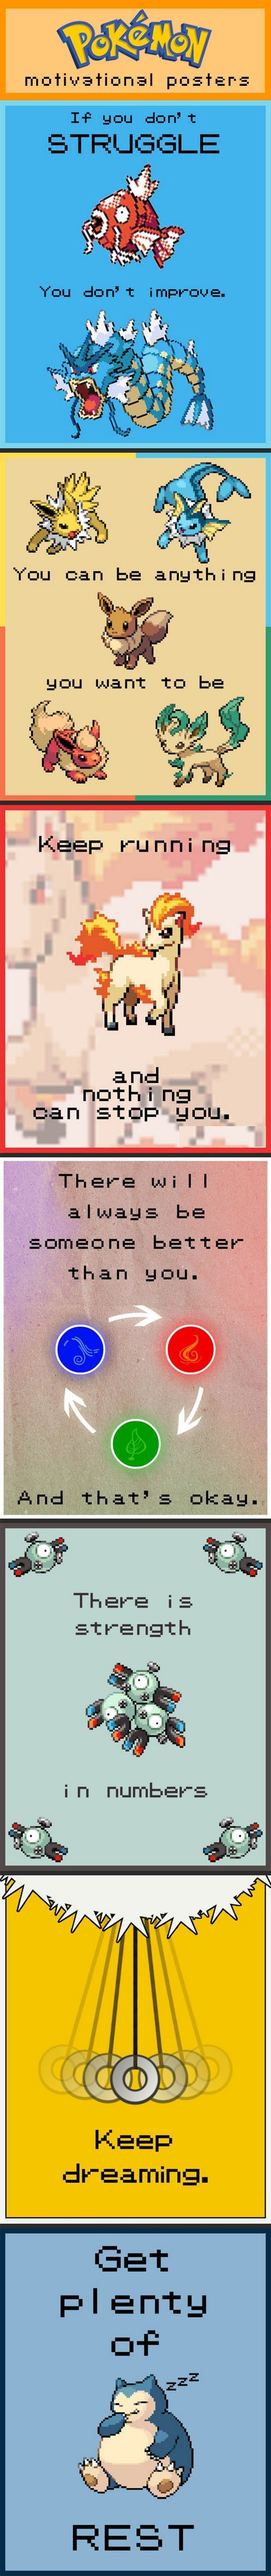 Motivational Pokemon.